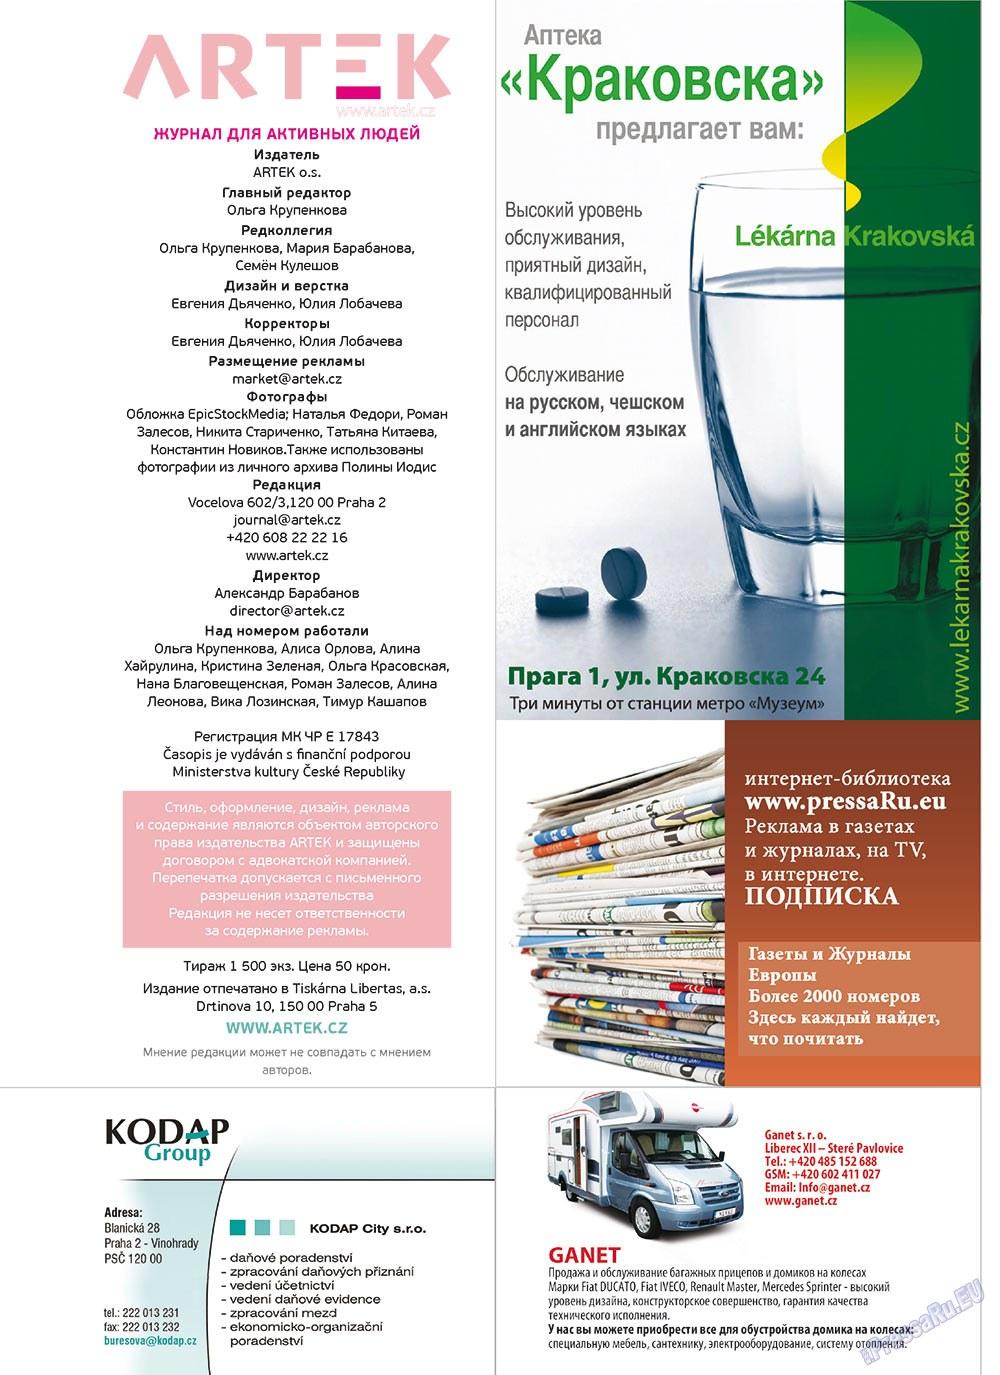 Артек (журнал). 2012 год, номер 2, стр. 31